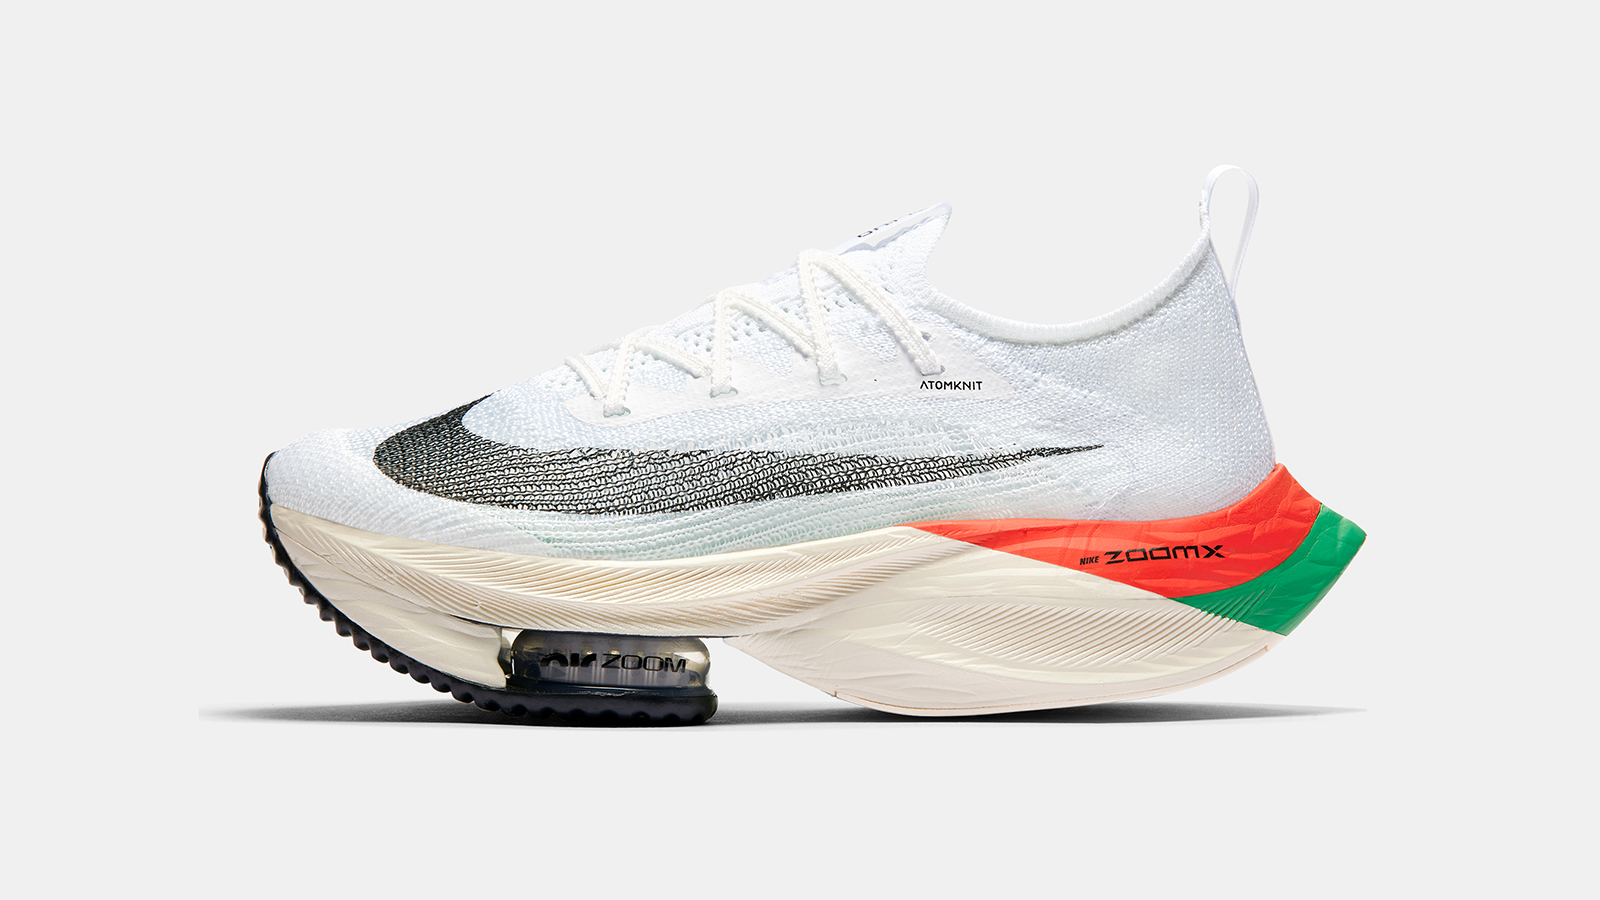 Nike Air Zoom Alphafly NEXT% Kenya, 1:59:40 & Mango